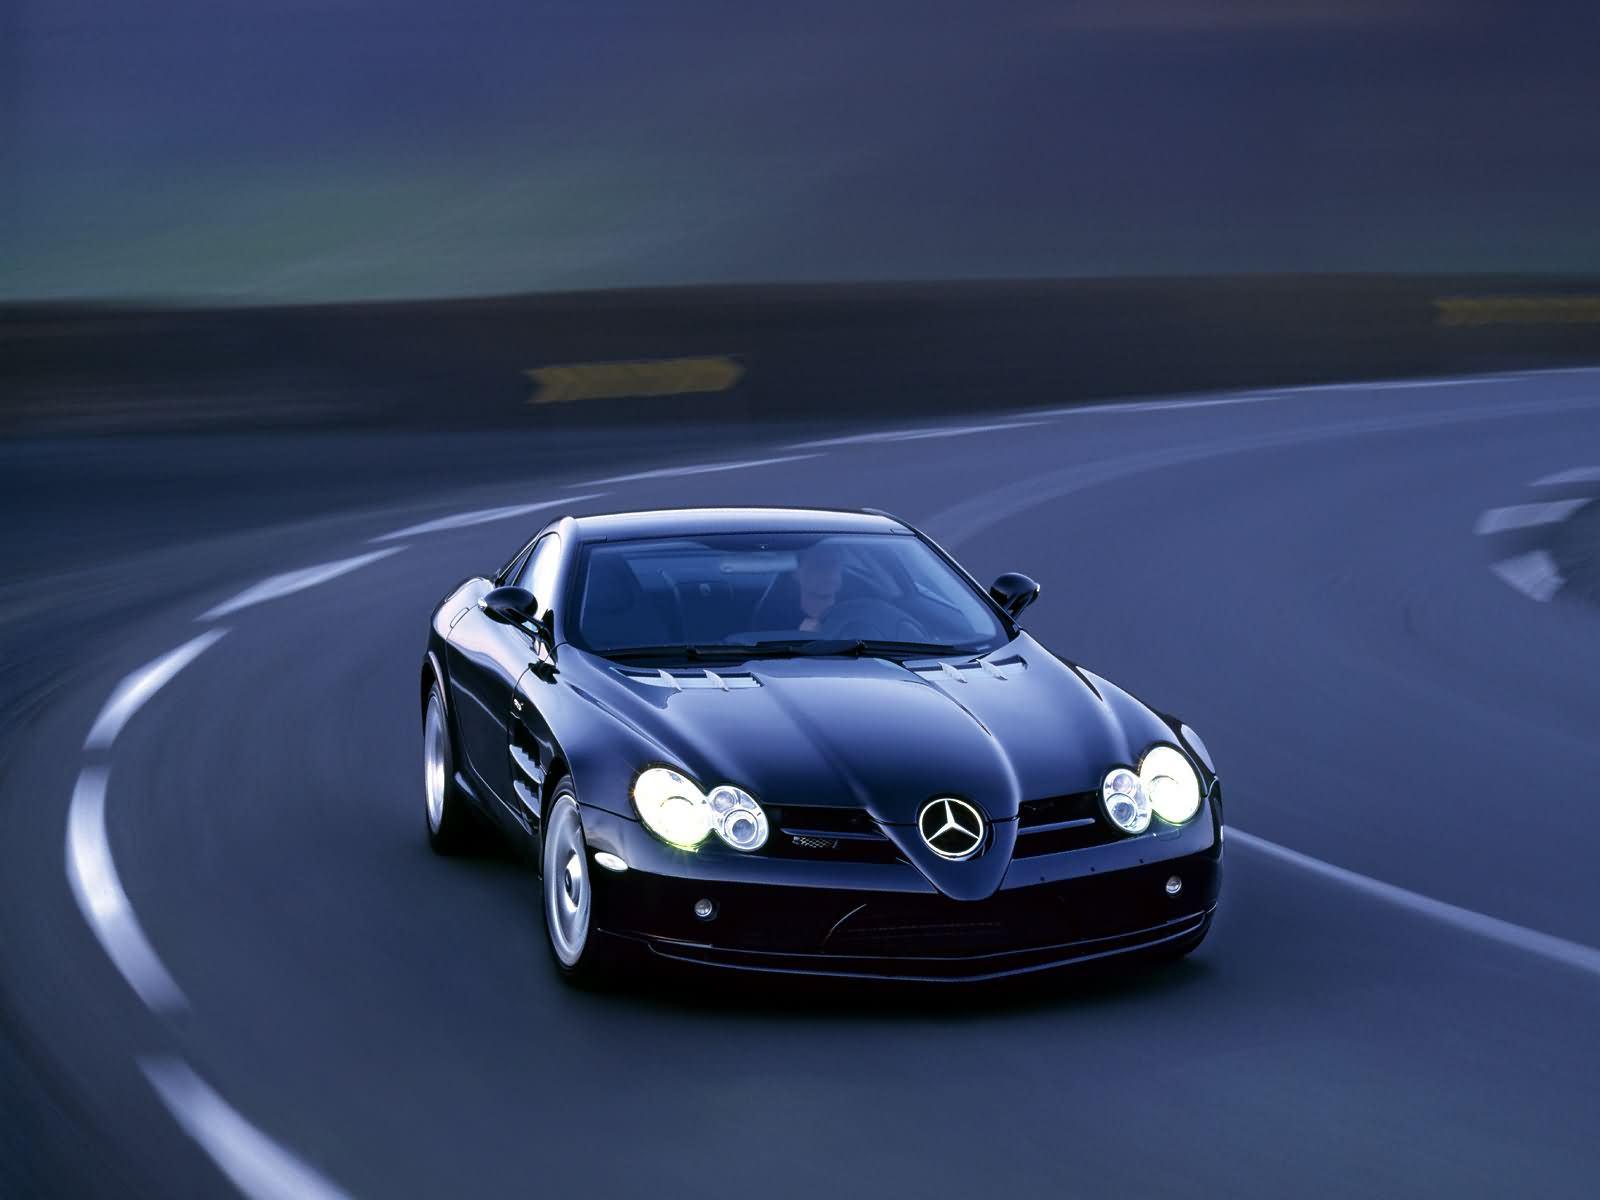 Luxury Vehicle: HD Desktop Wallpaper Exotic Cars